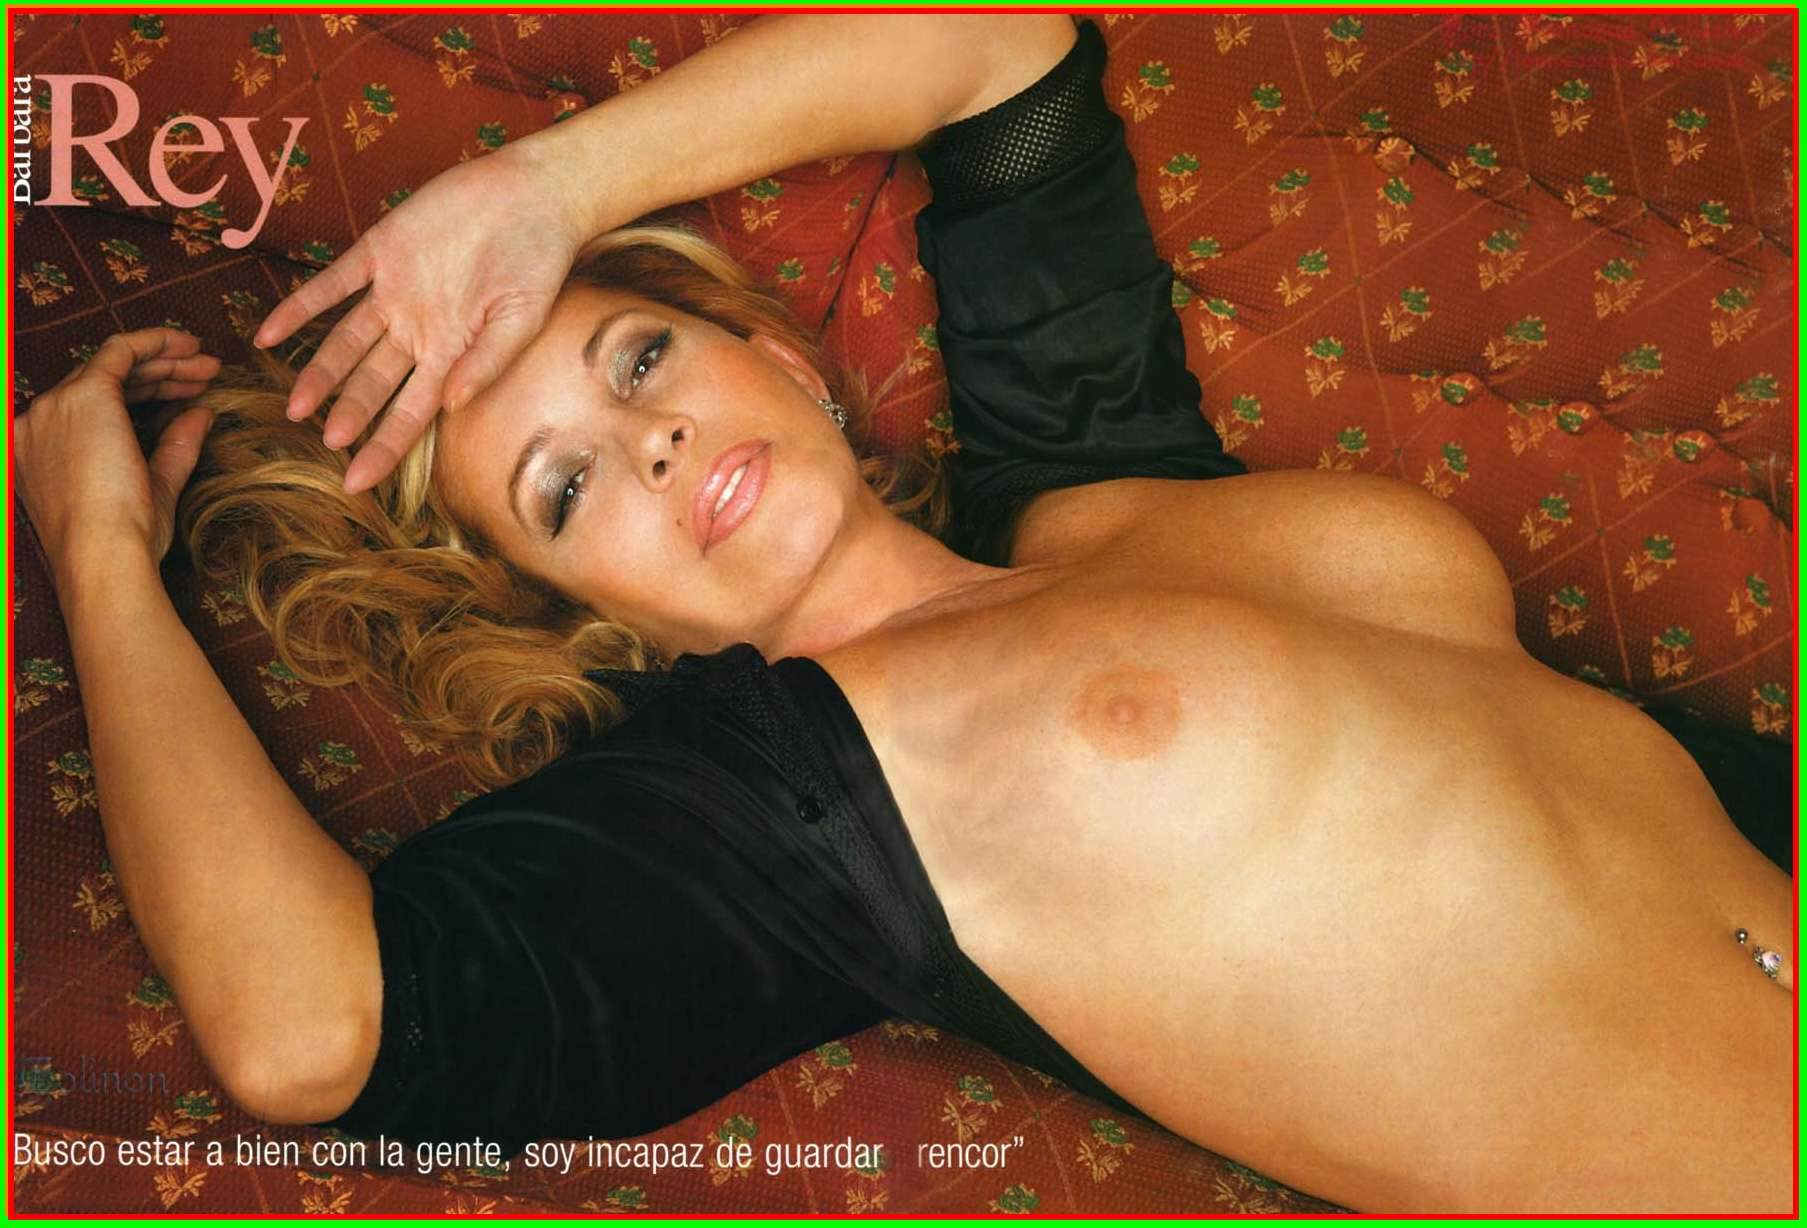 Fotos desnudas de ray mestyrio